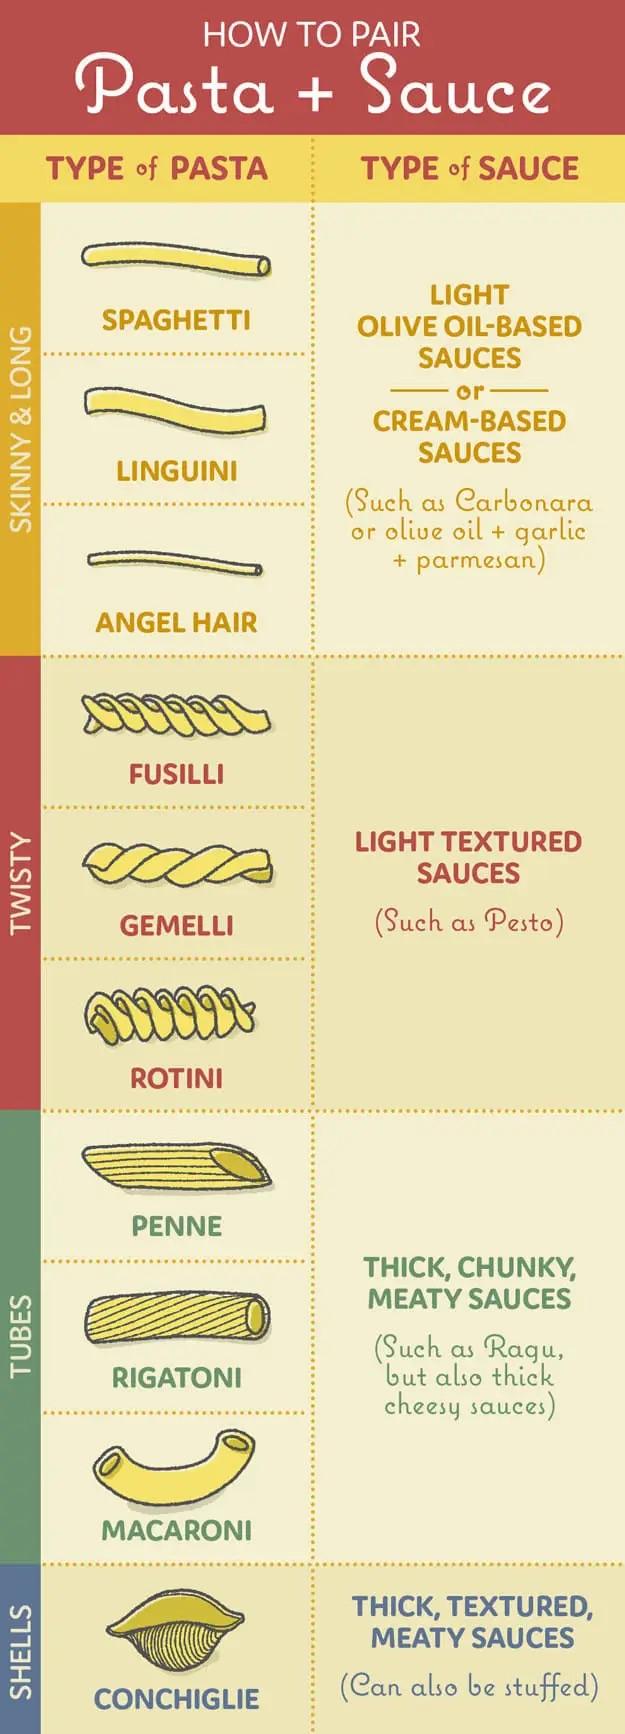 How to pair pasta sauces